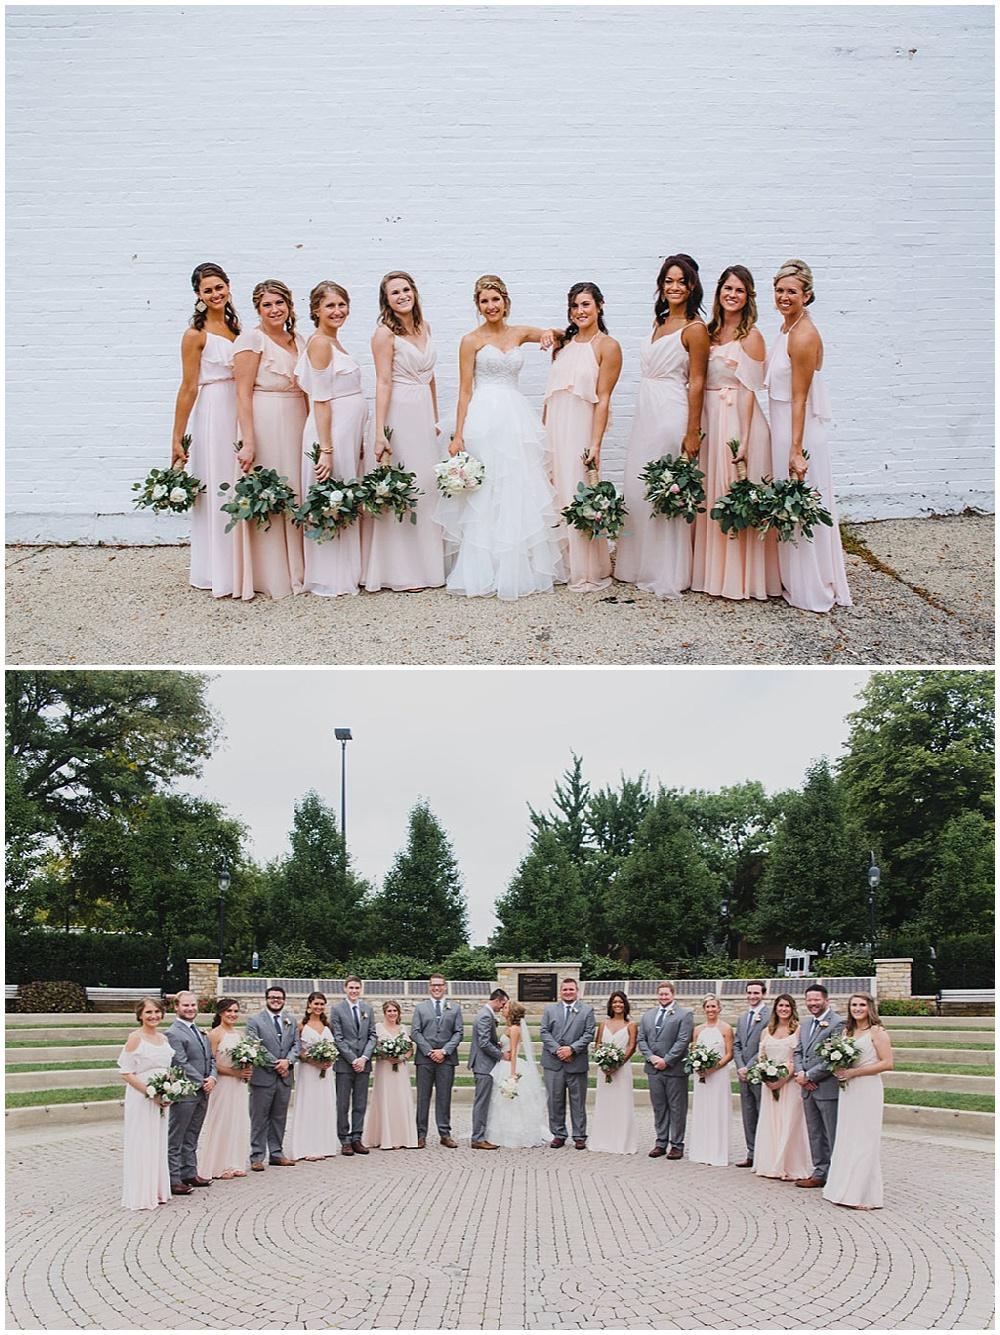 blush and gray bridal party | Chicago urban rustic wedding| Sandra Armenteros Photography | Jessica Dum Wedding Coordination